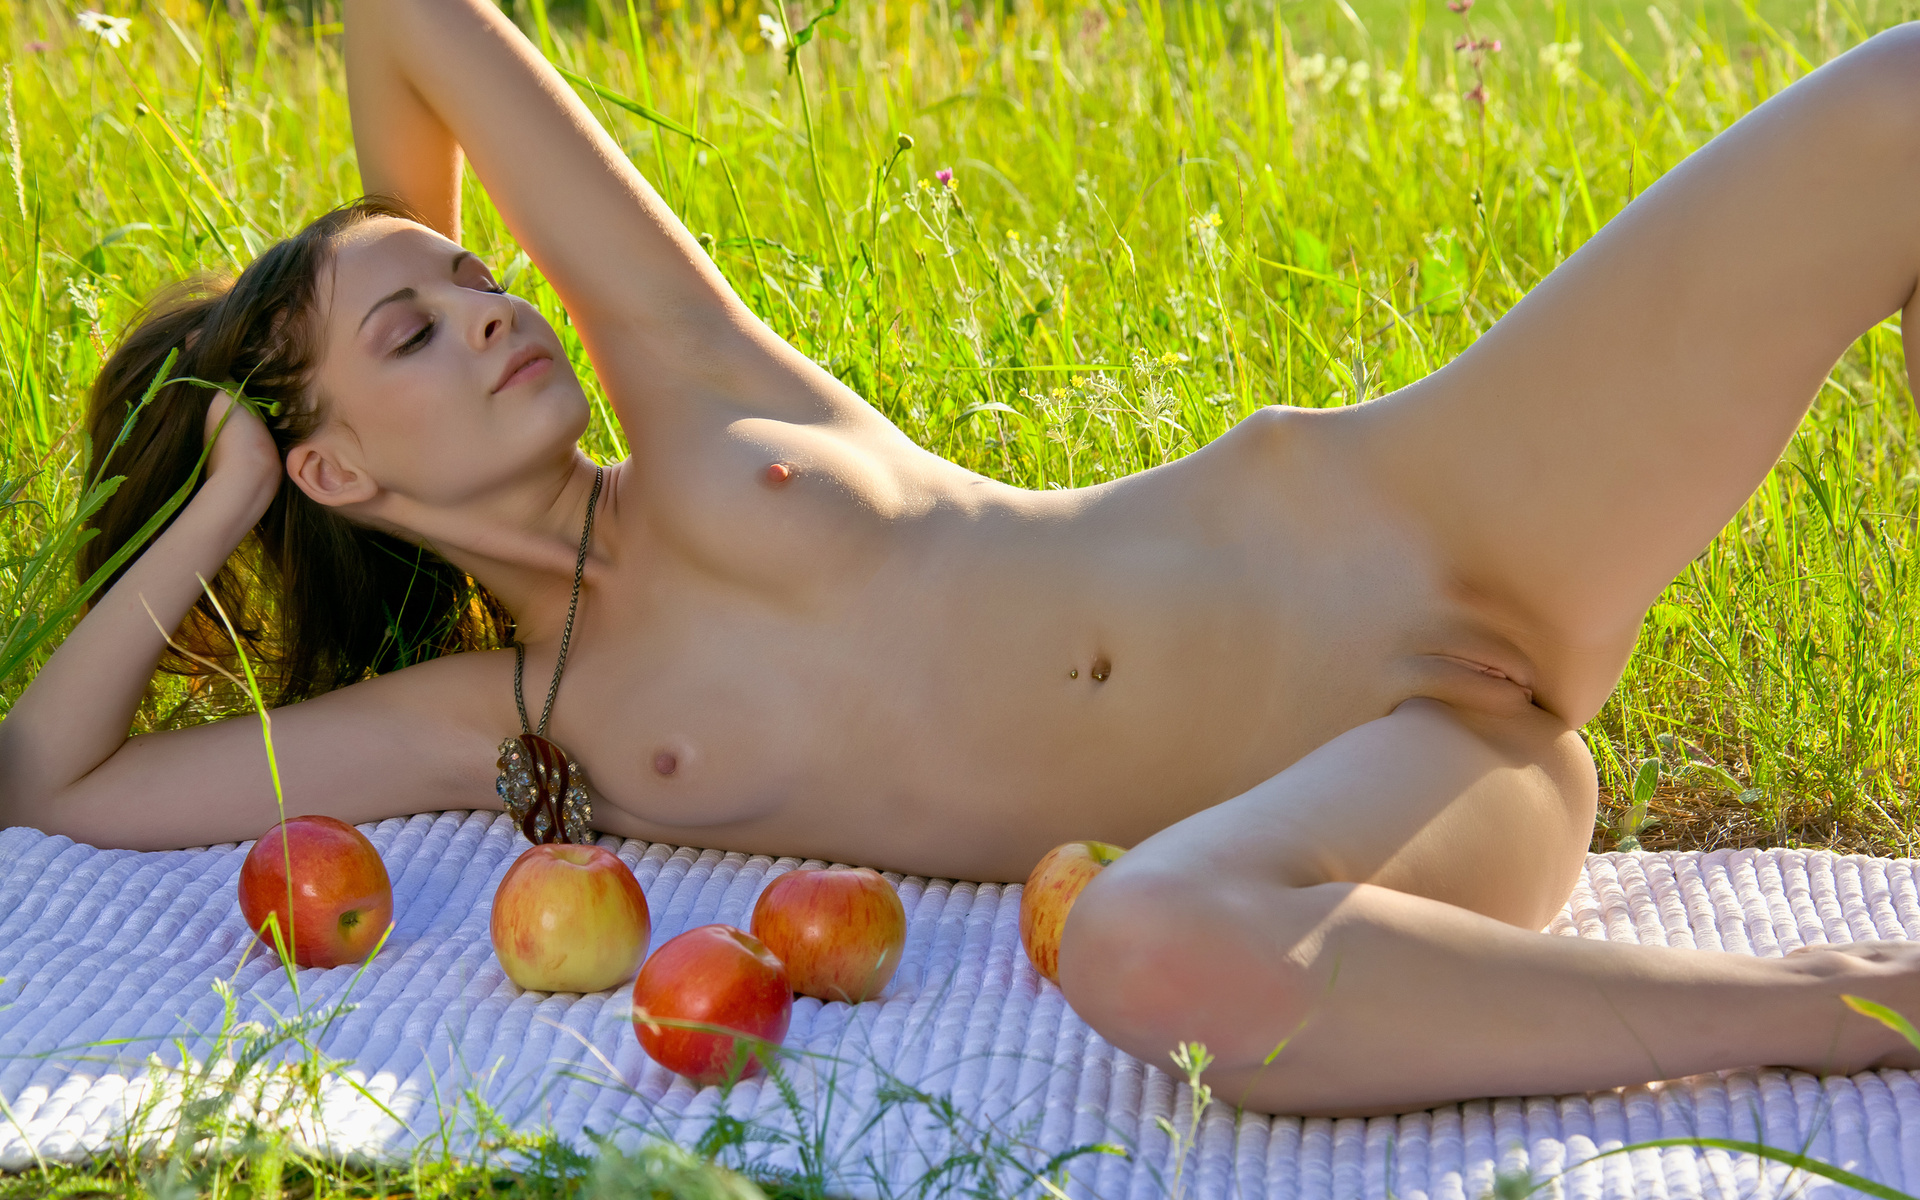 devushki-s-yablokami-kartinki-eroticheskie